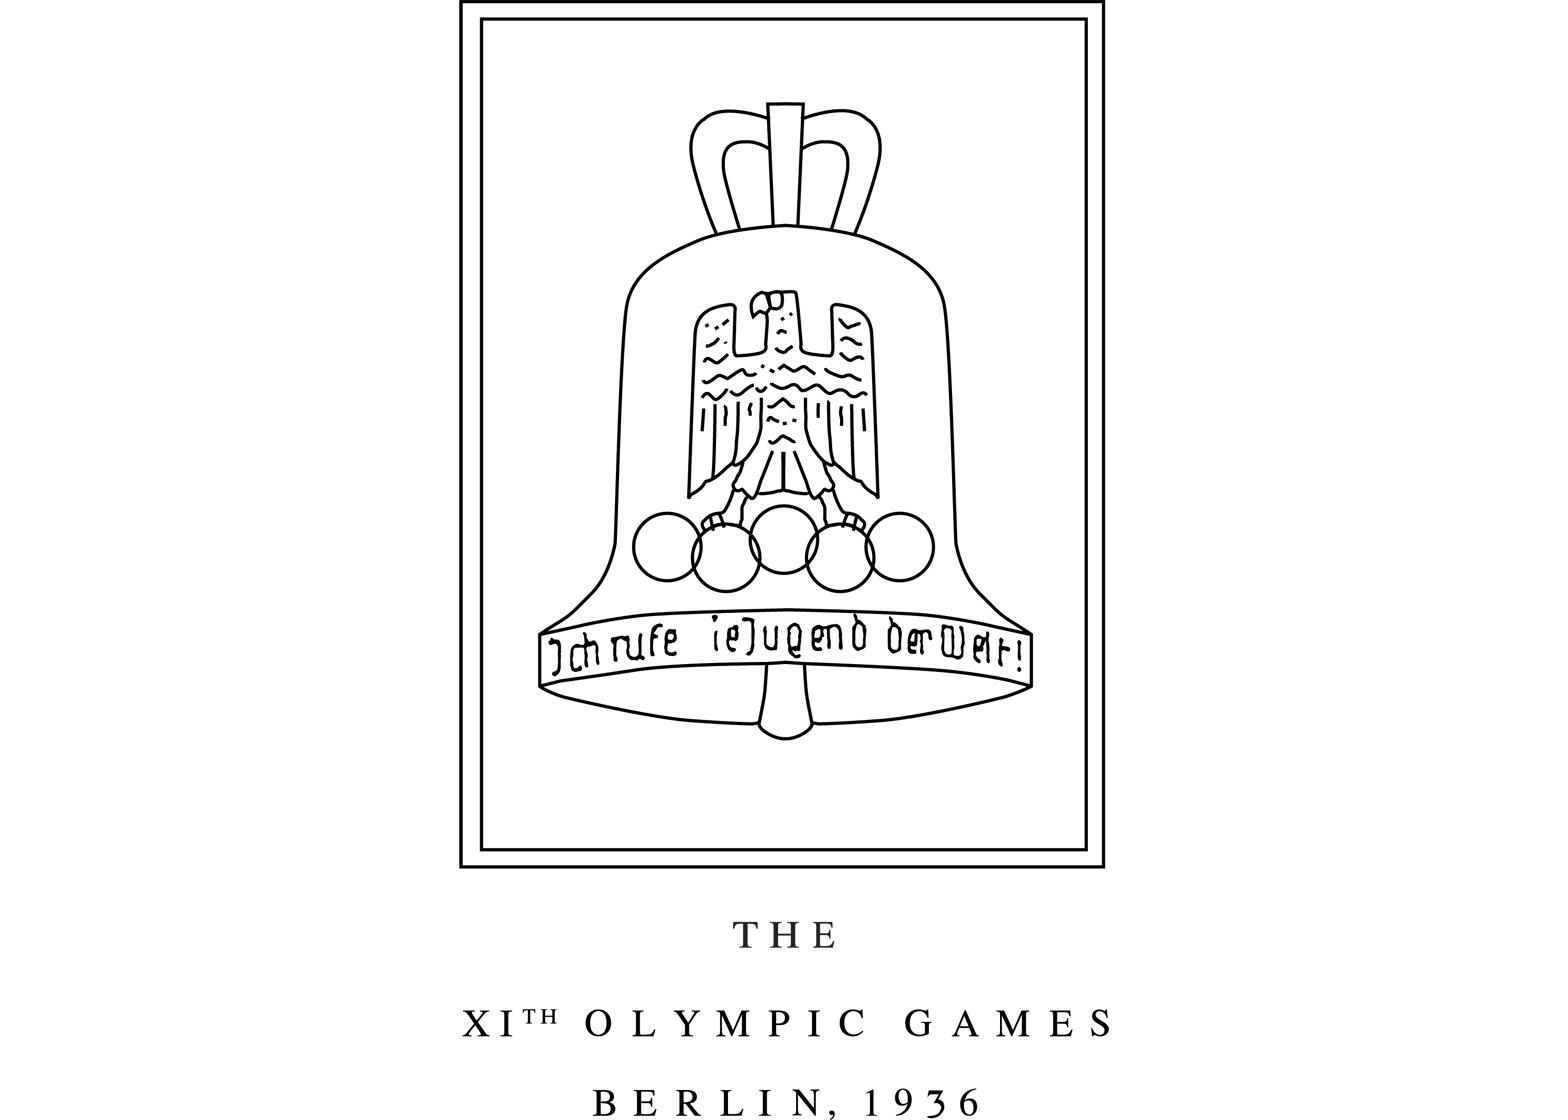 Logo of the 1936 Berlin Olympics